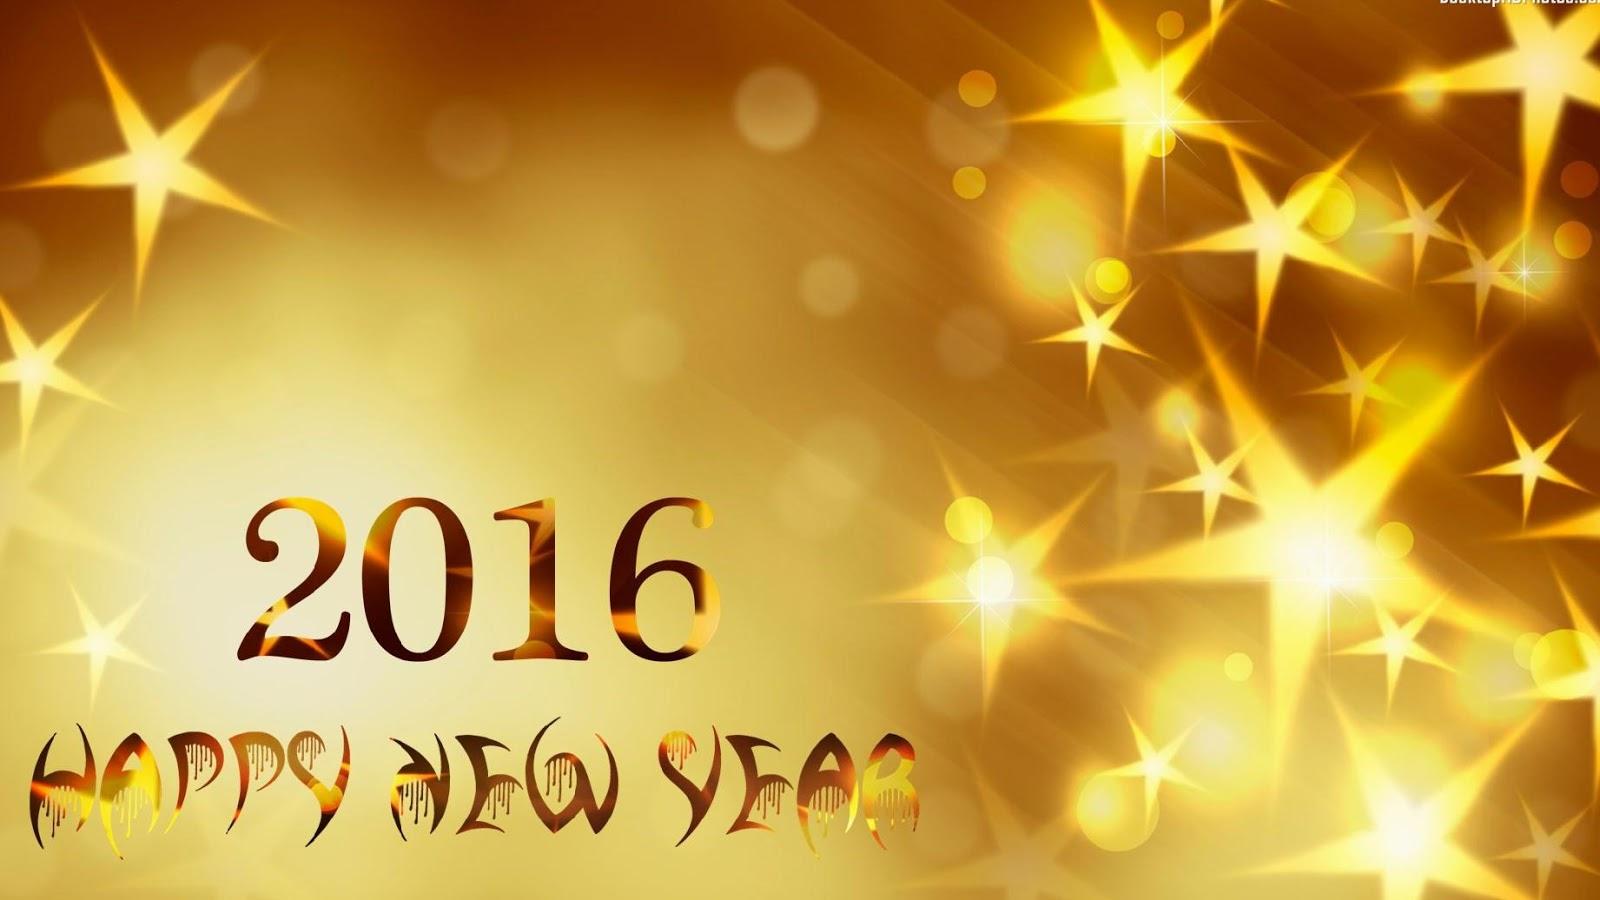 UCAPAN TAHUN BARU 2016 DP PP Gambar Selamat Tahun Baru 2016 WA